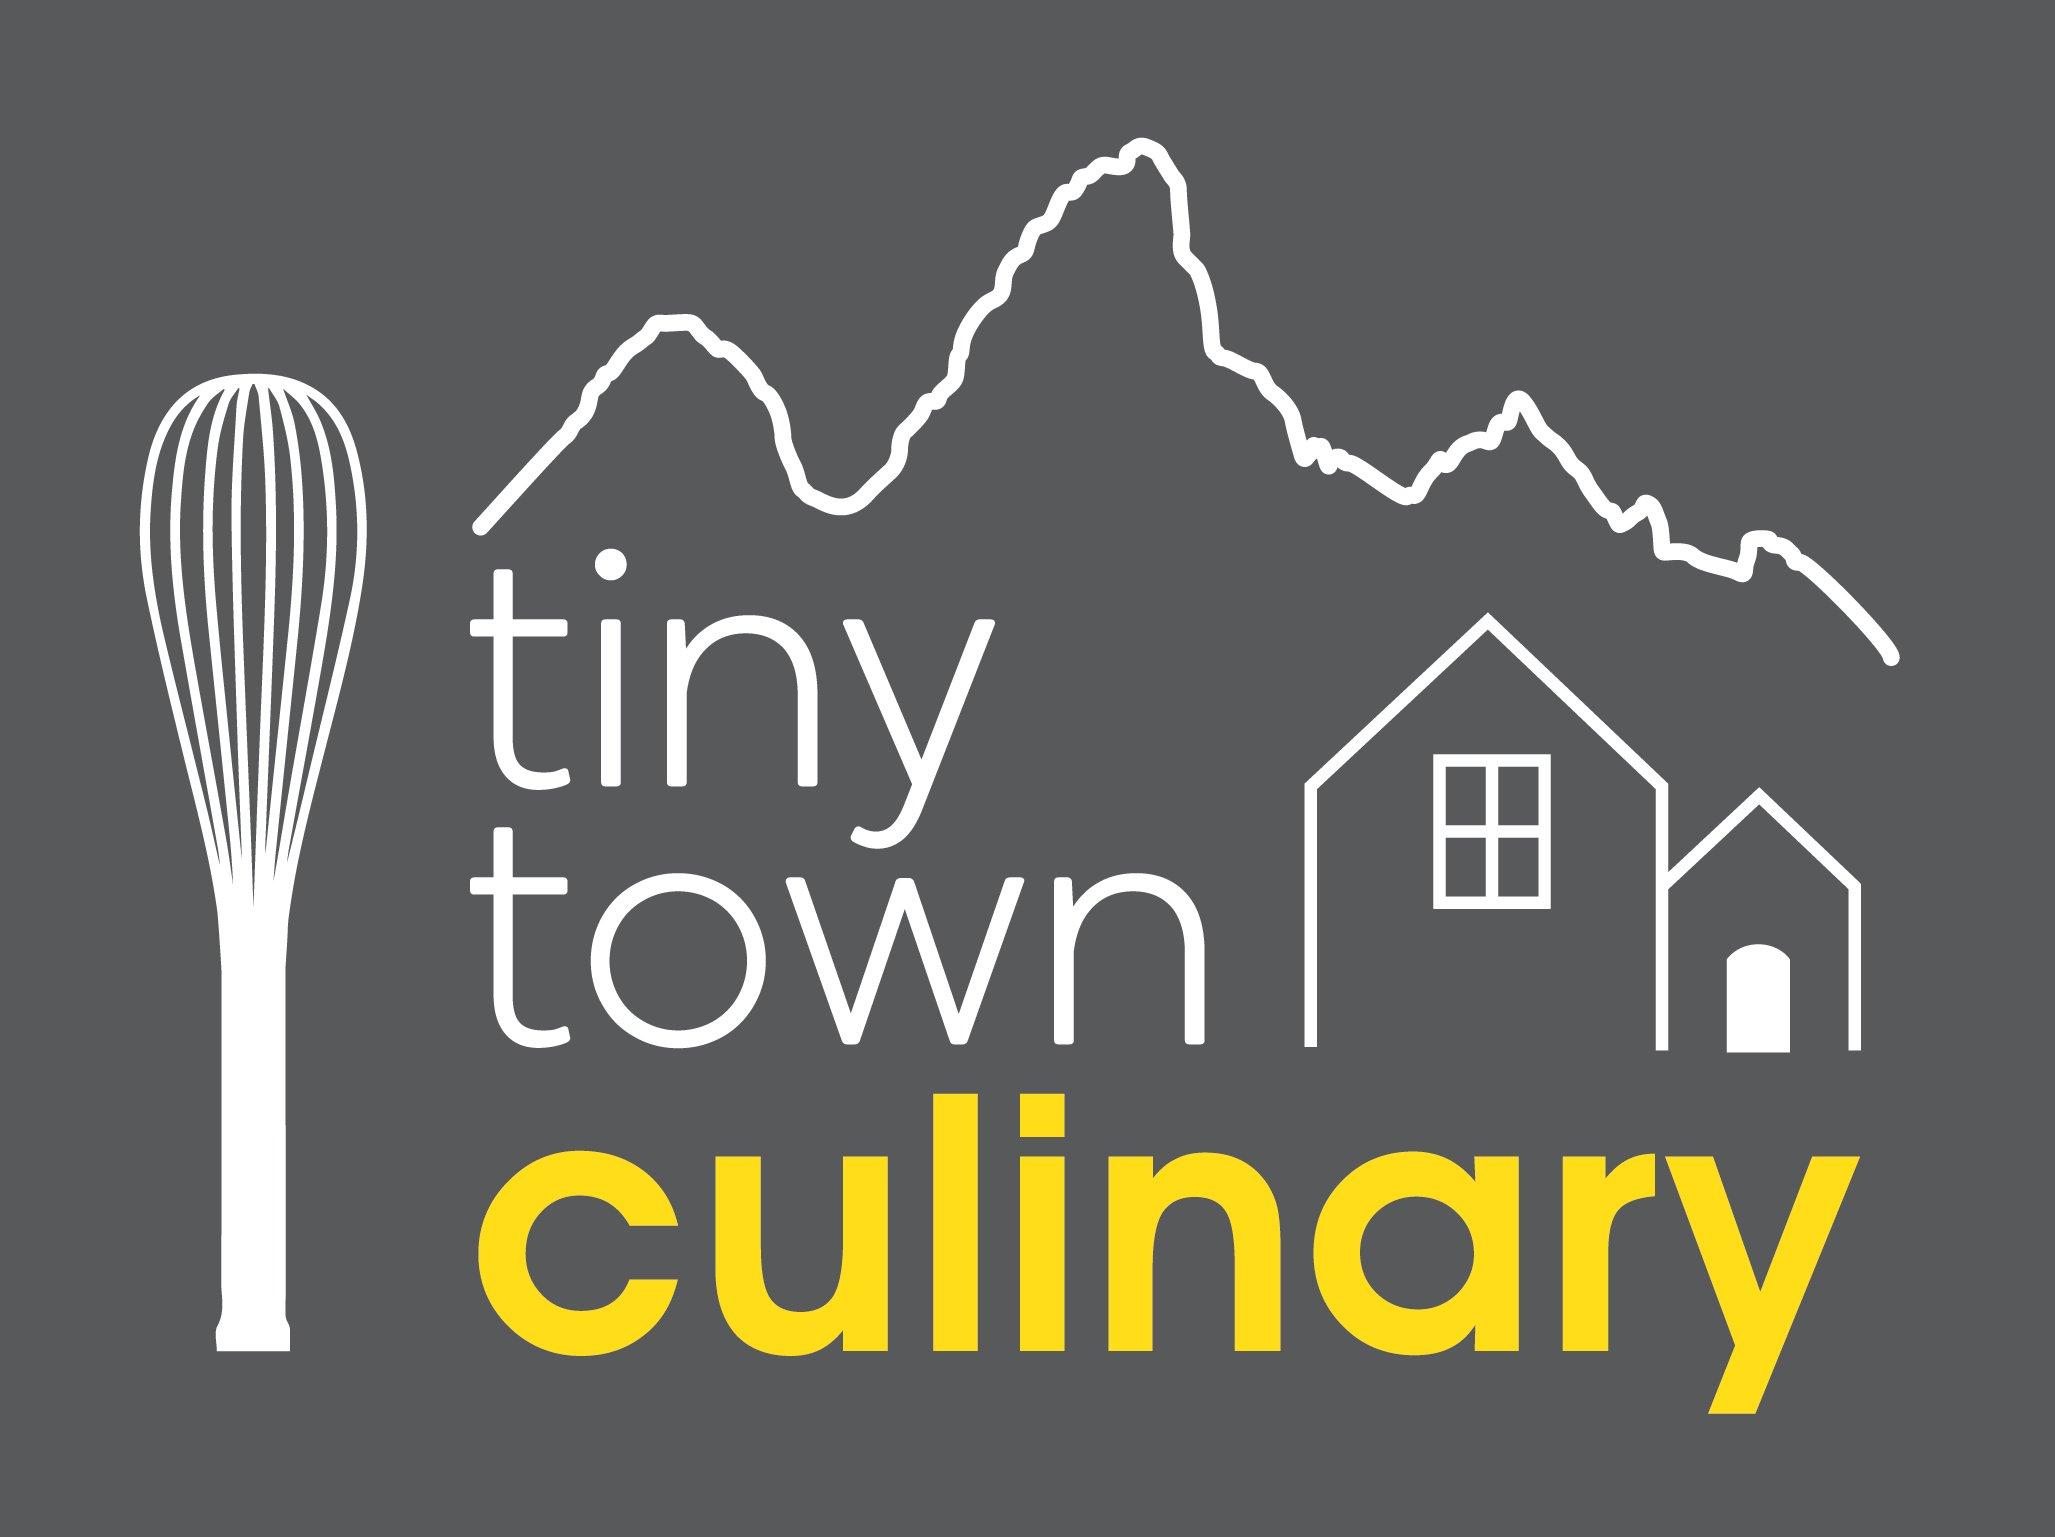 Tiny Town Culinary